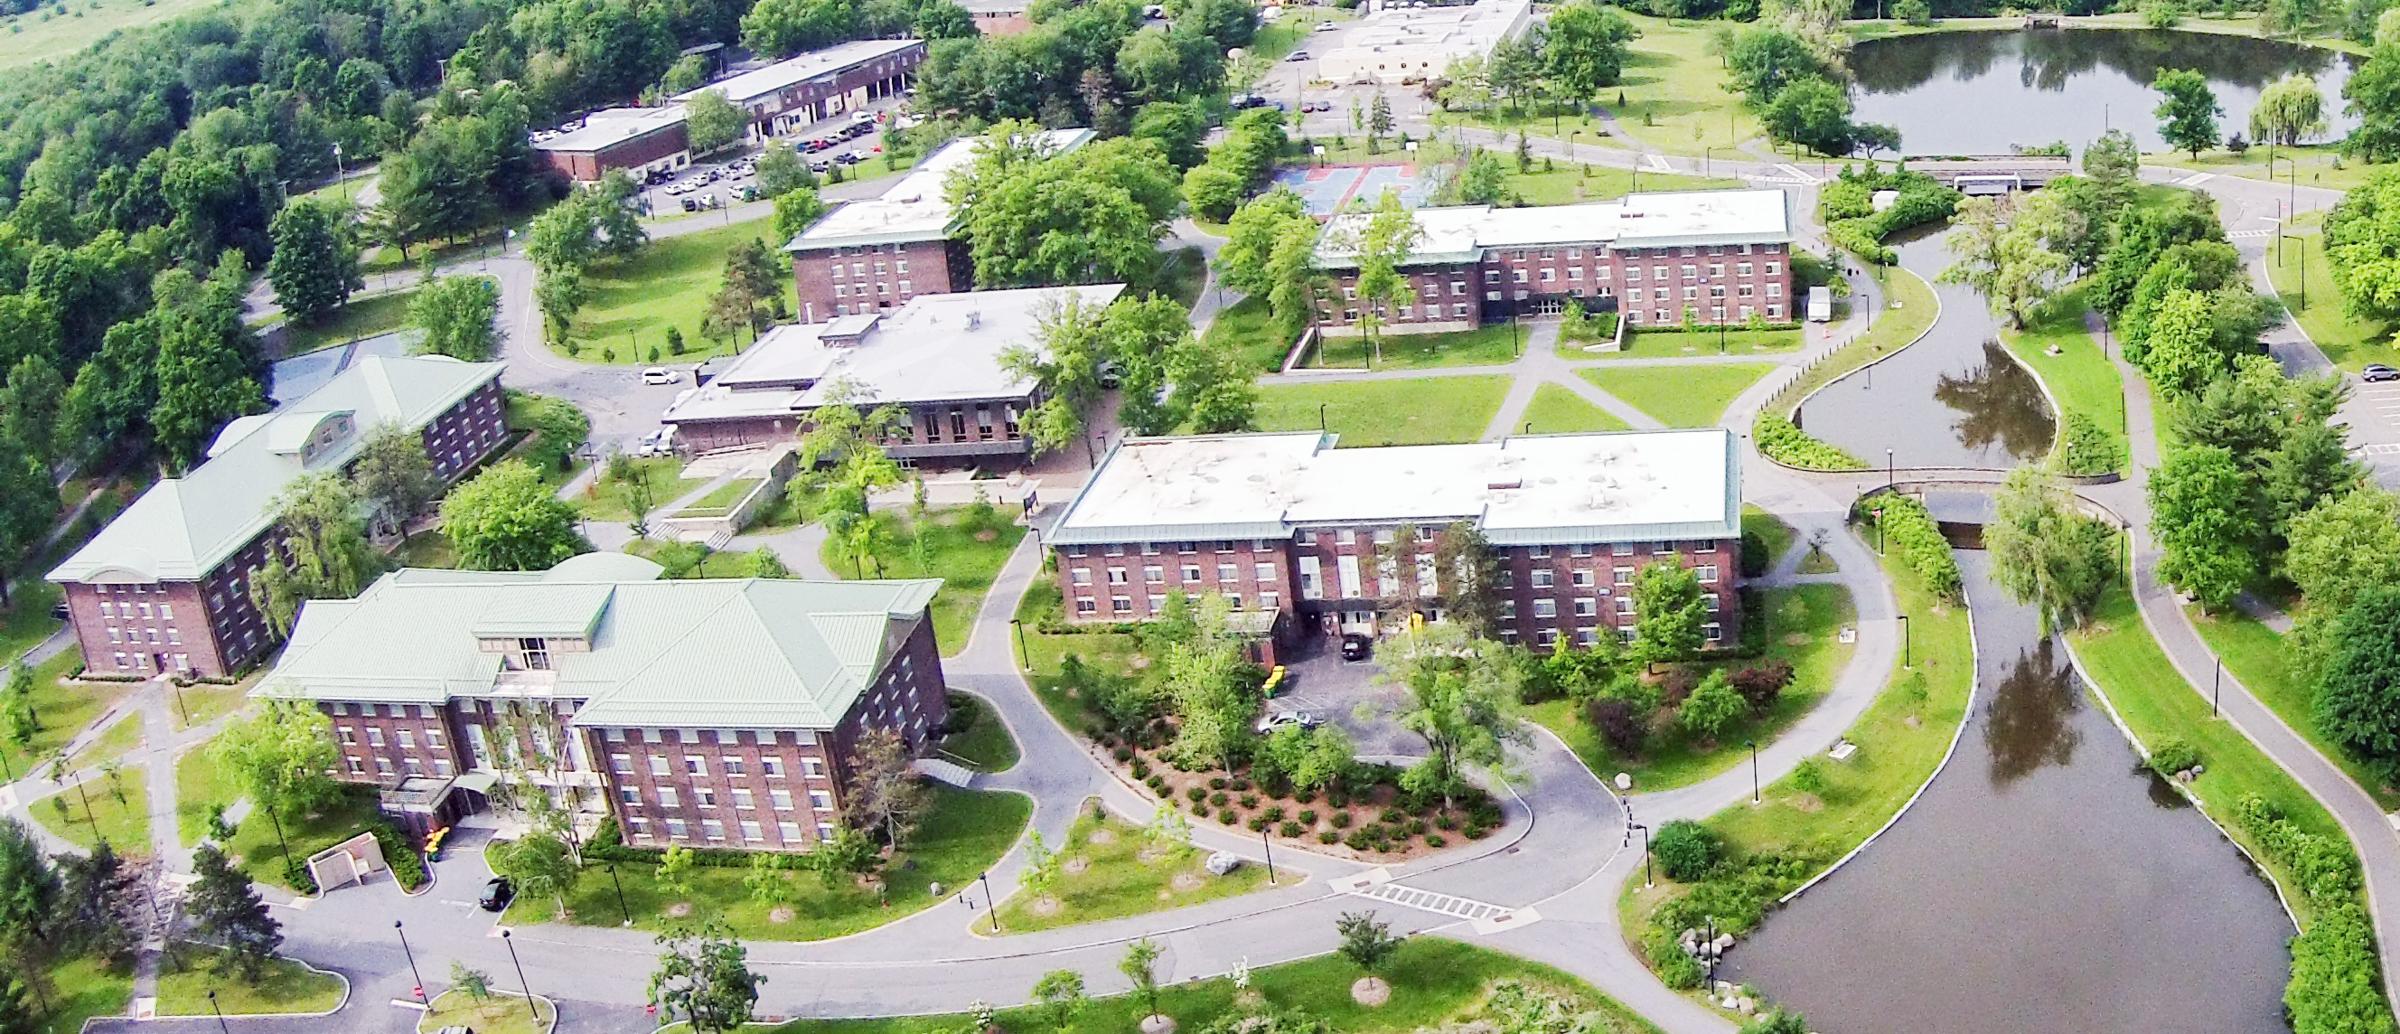 Suny New Paltz President: Renaming Buildings Would Be Anti Throughout Suny New Paltz School Caledar